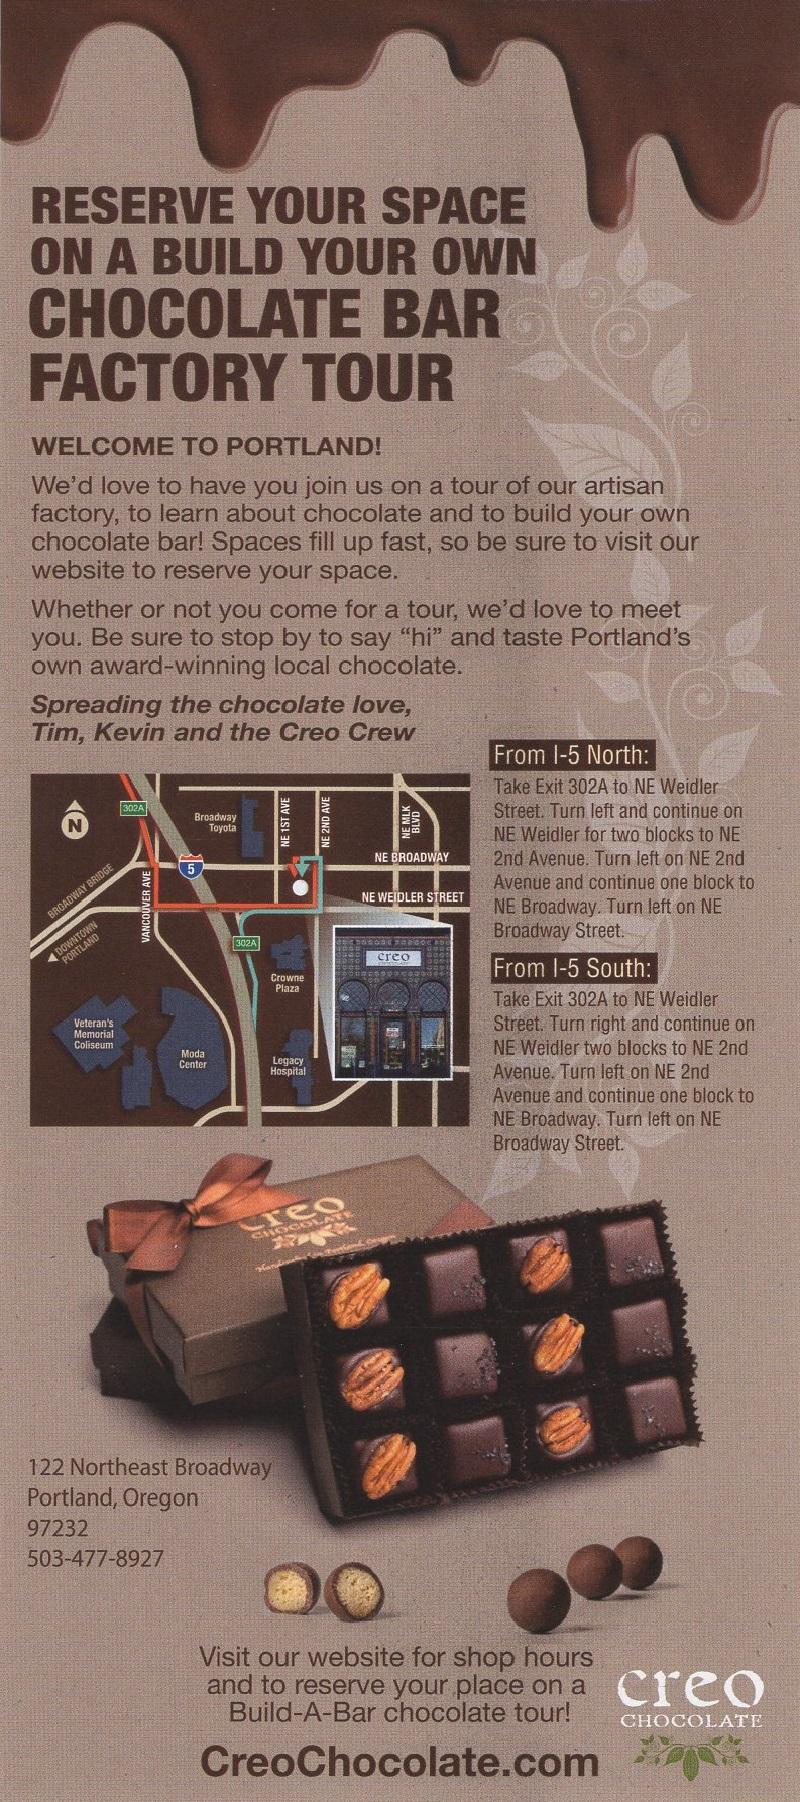 Creo Chocolate Factory Tours brochure thumbnail